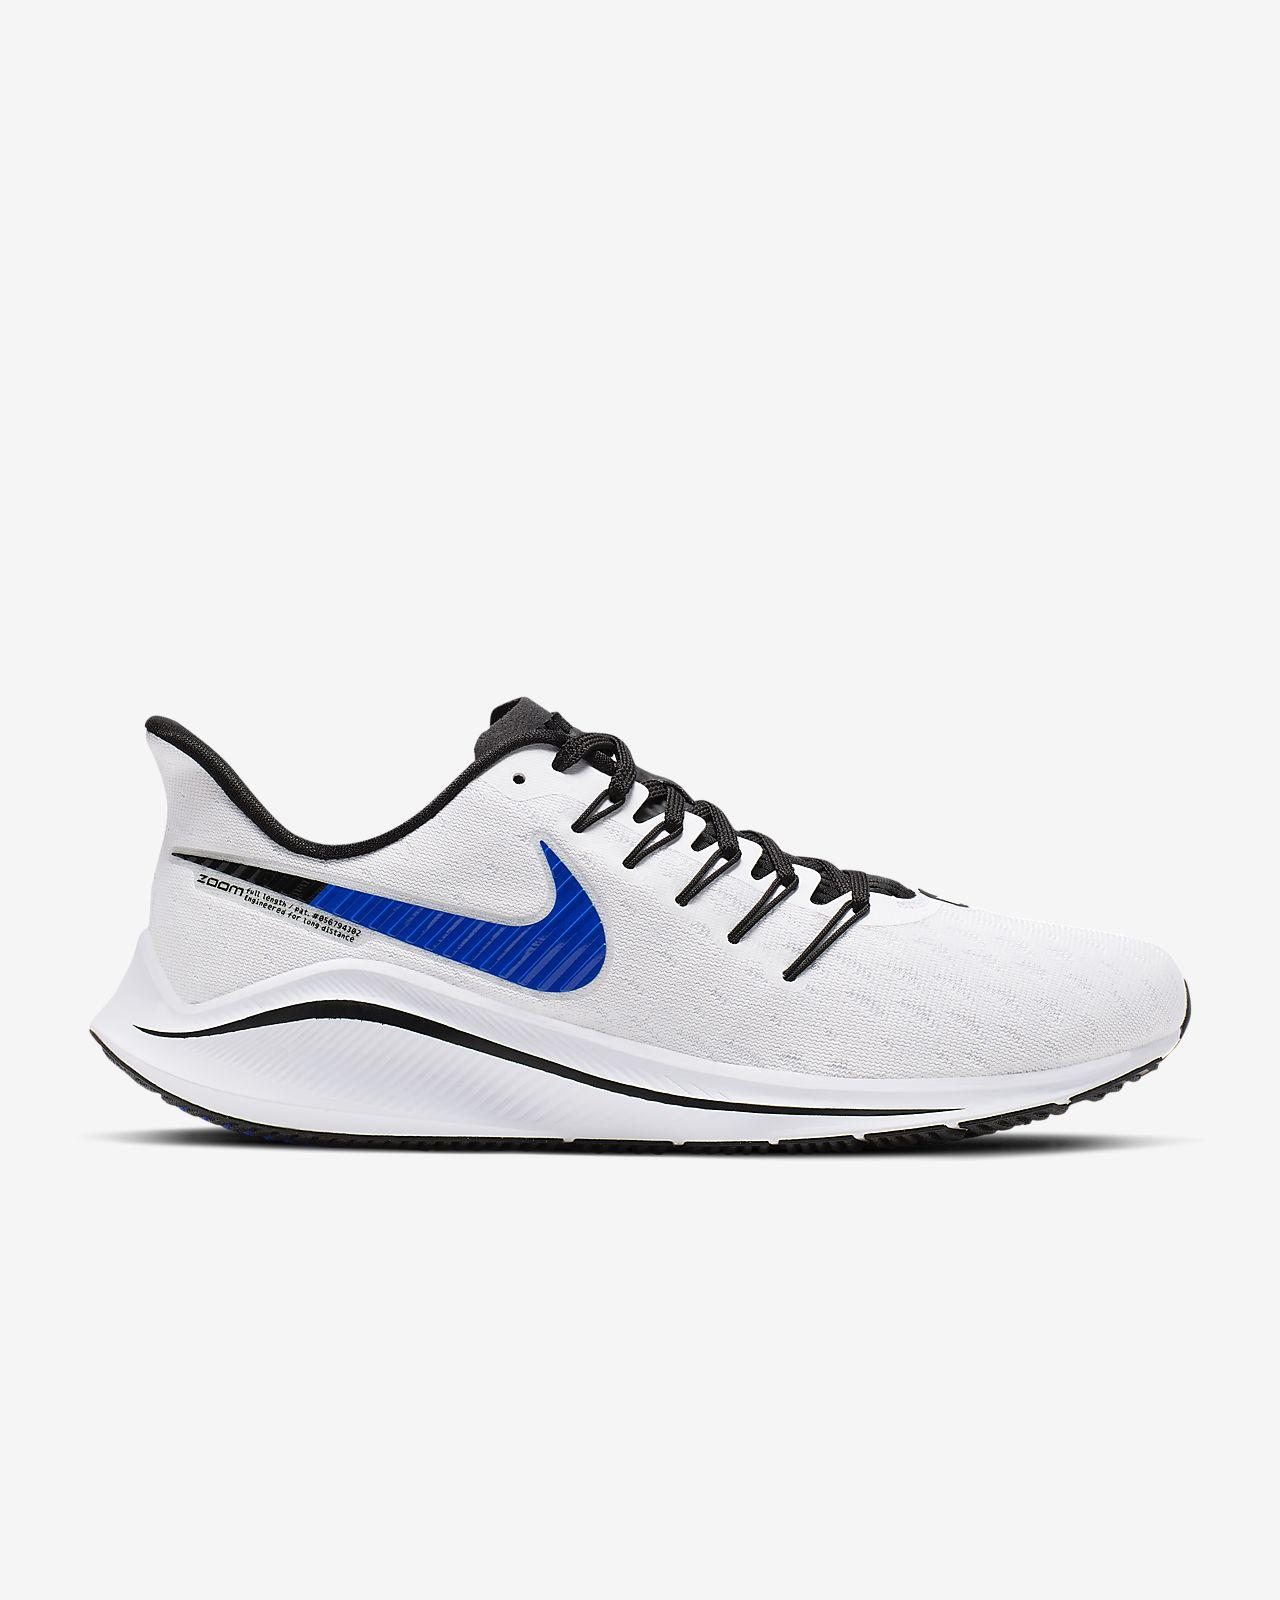 que vaut la chaussure nike air zoom vomero 14